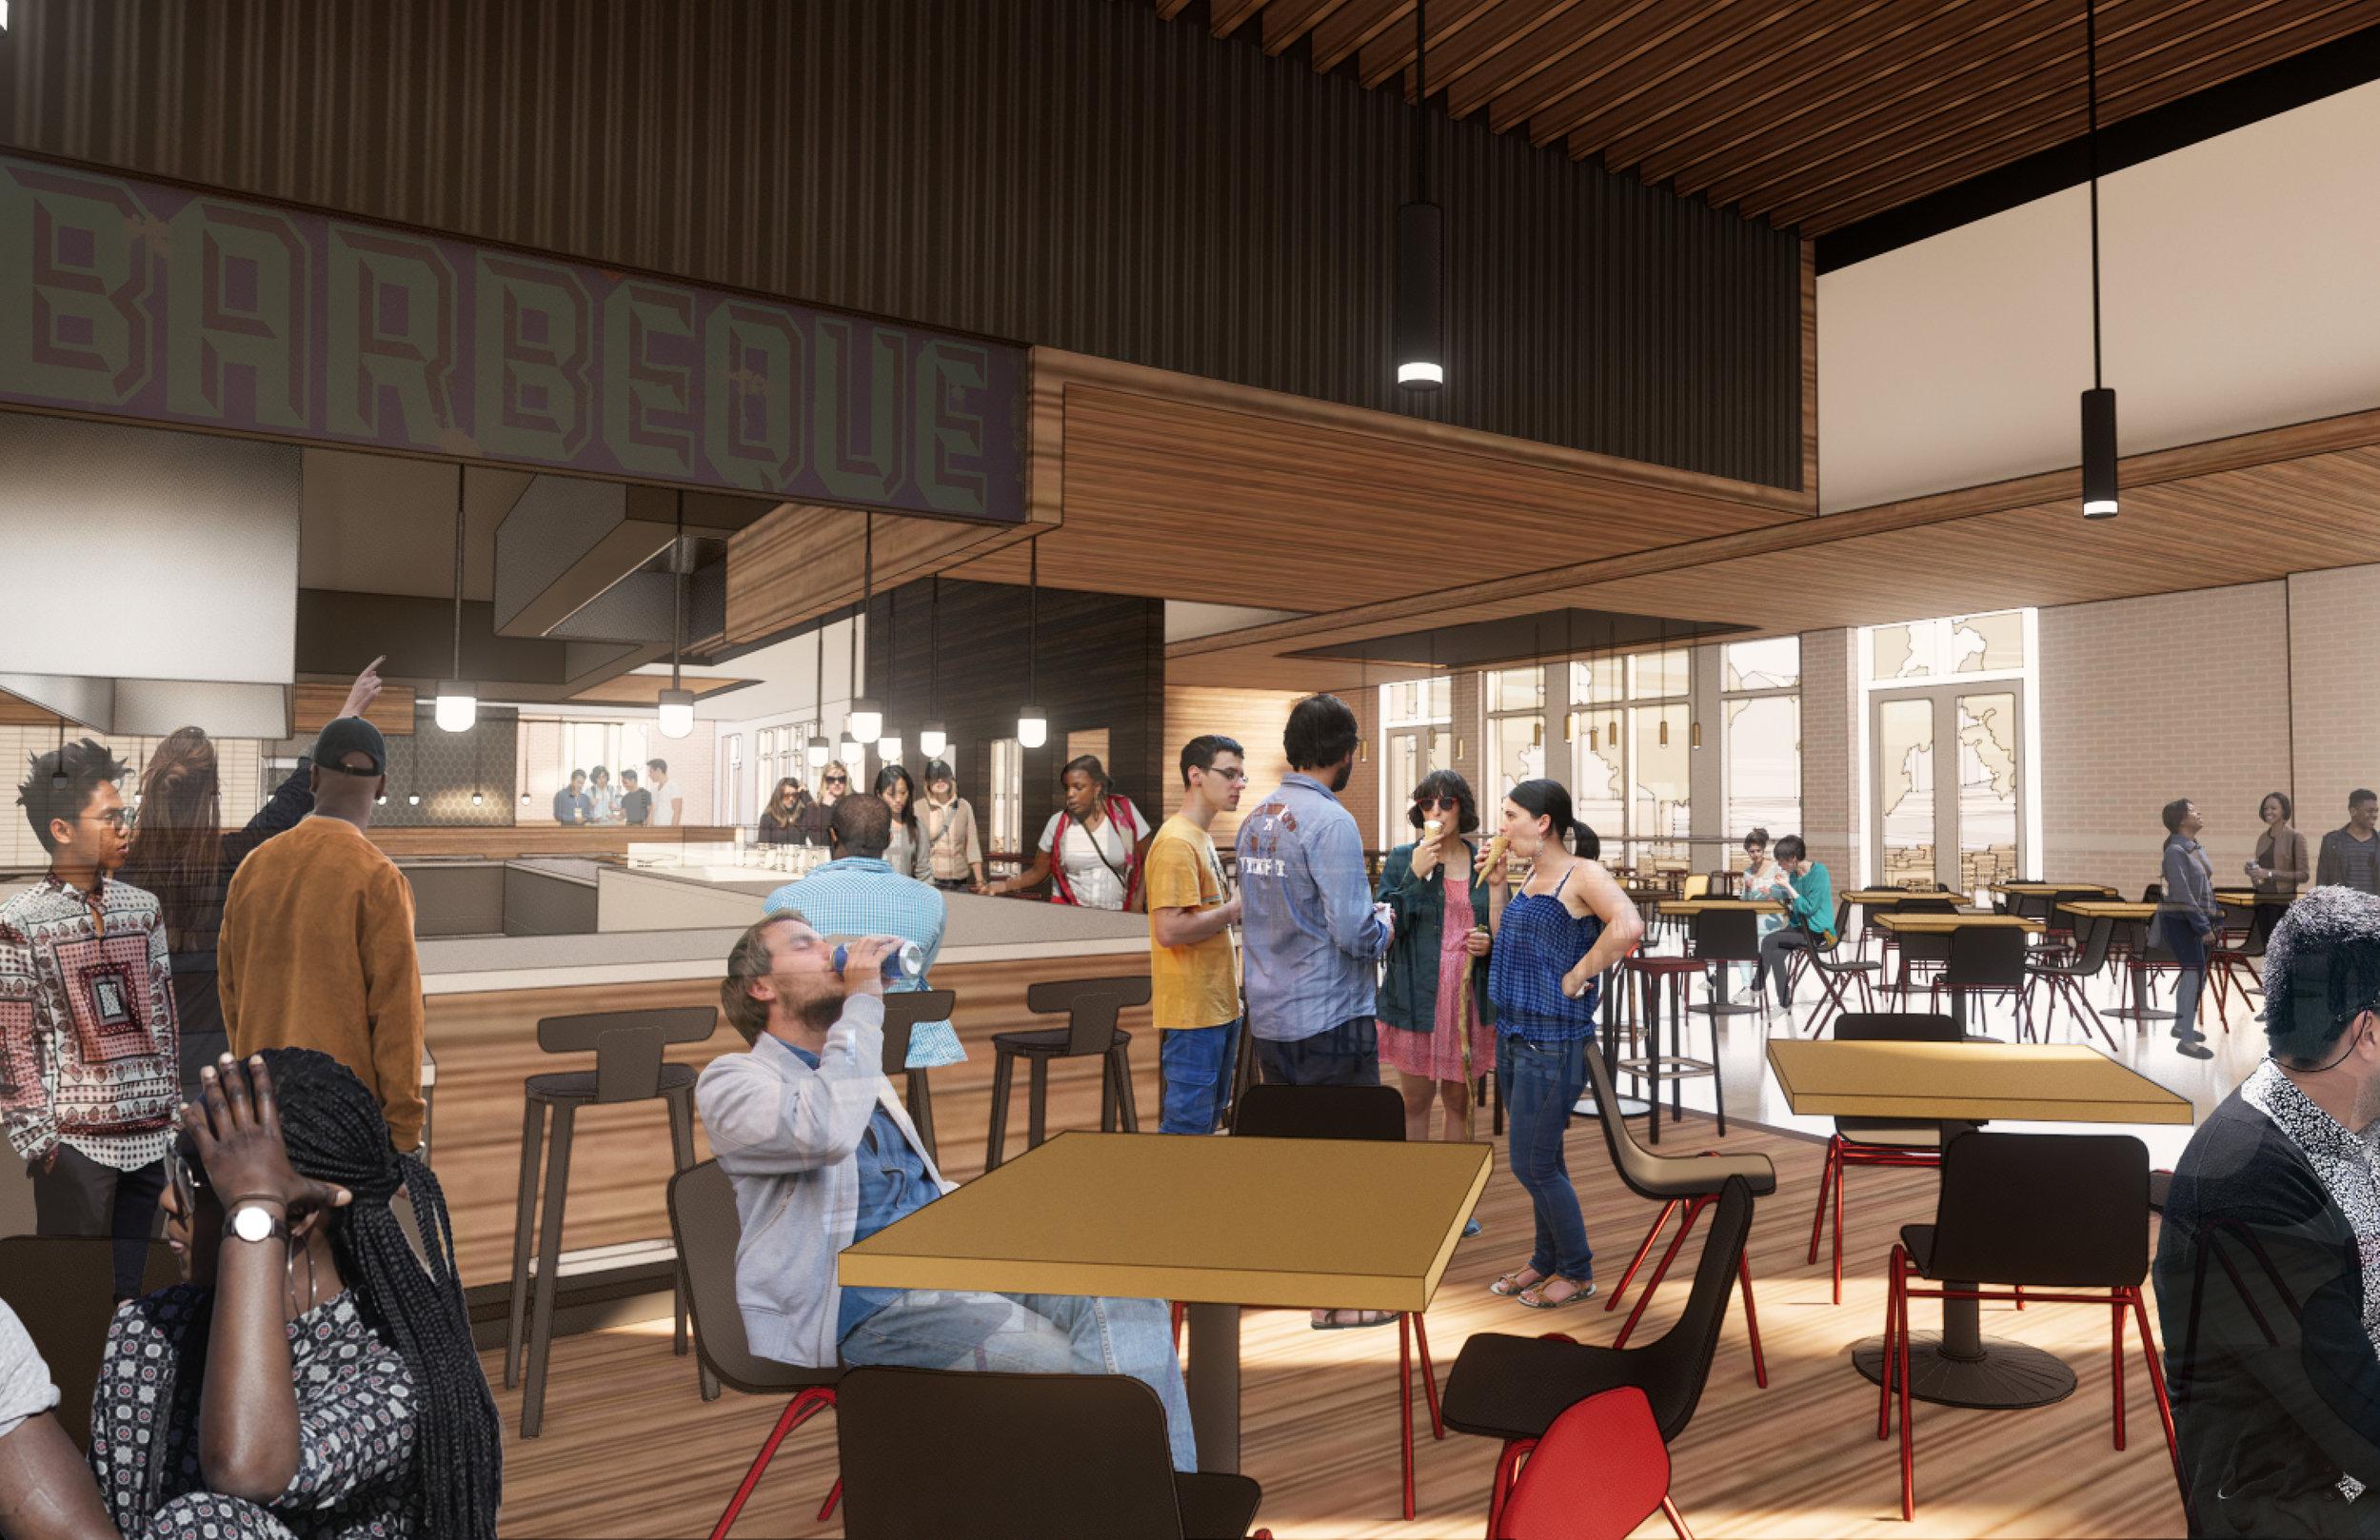 Interior - Food Hall Dining.jpg